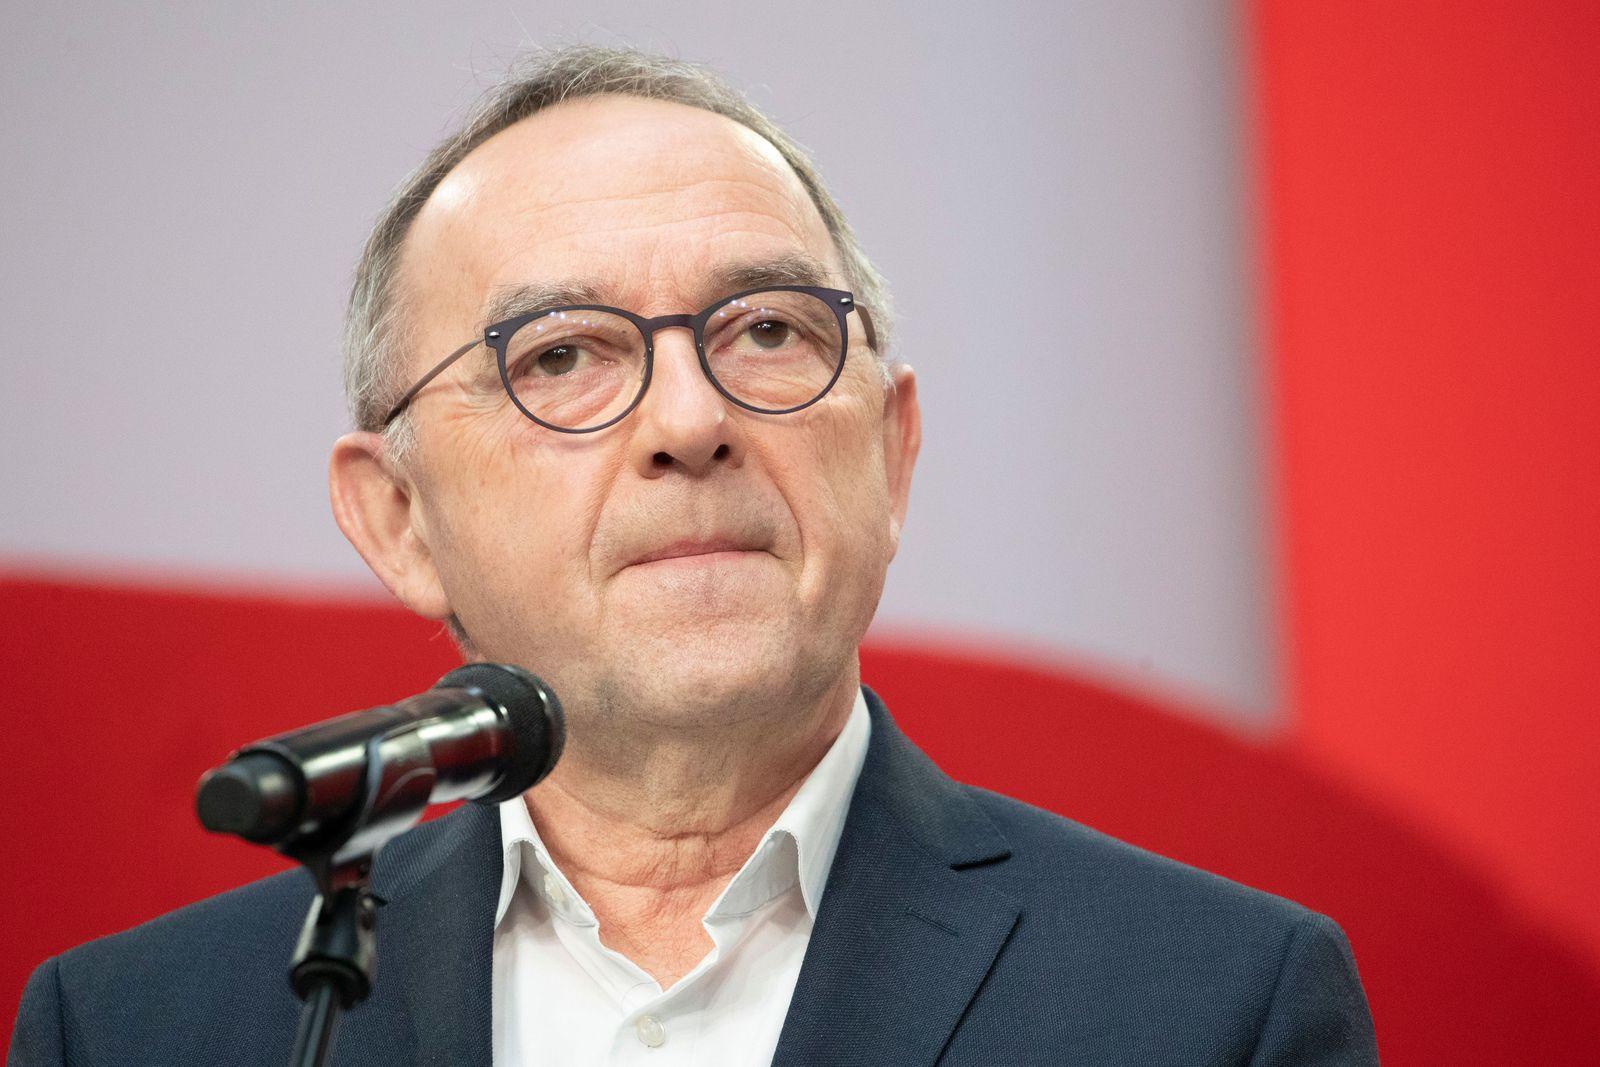 Social Democrats (SPD) Hold Two-Day Virtual Retreat, Berlin, Germany - 07 Feb 2021